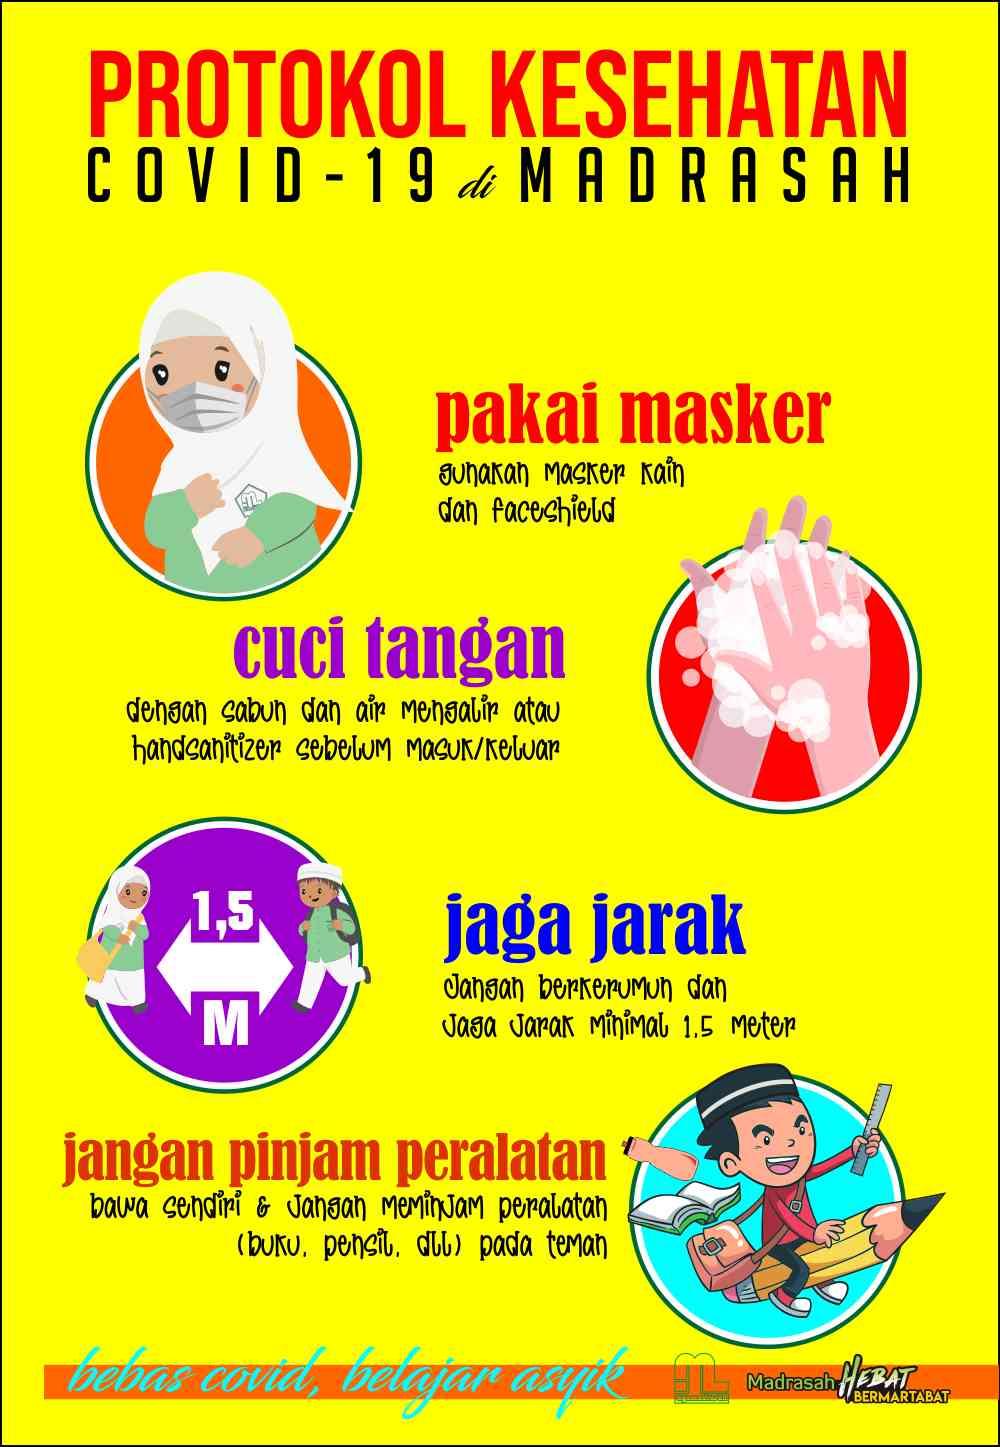 Contoh Poster Kesehatan : contoh, poster, kesehatan, Contoh, Poster, Protokol, Kesehatan, Sekolah, Madrasah